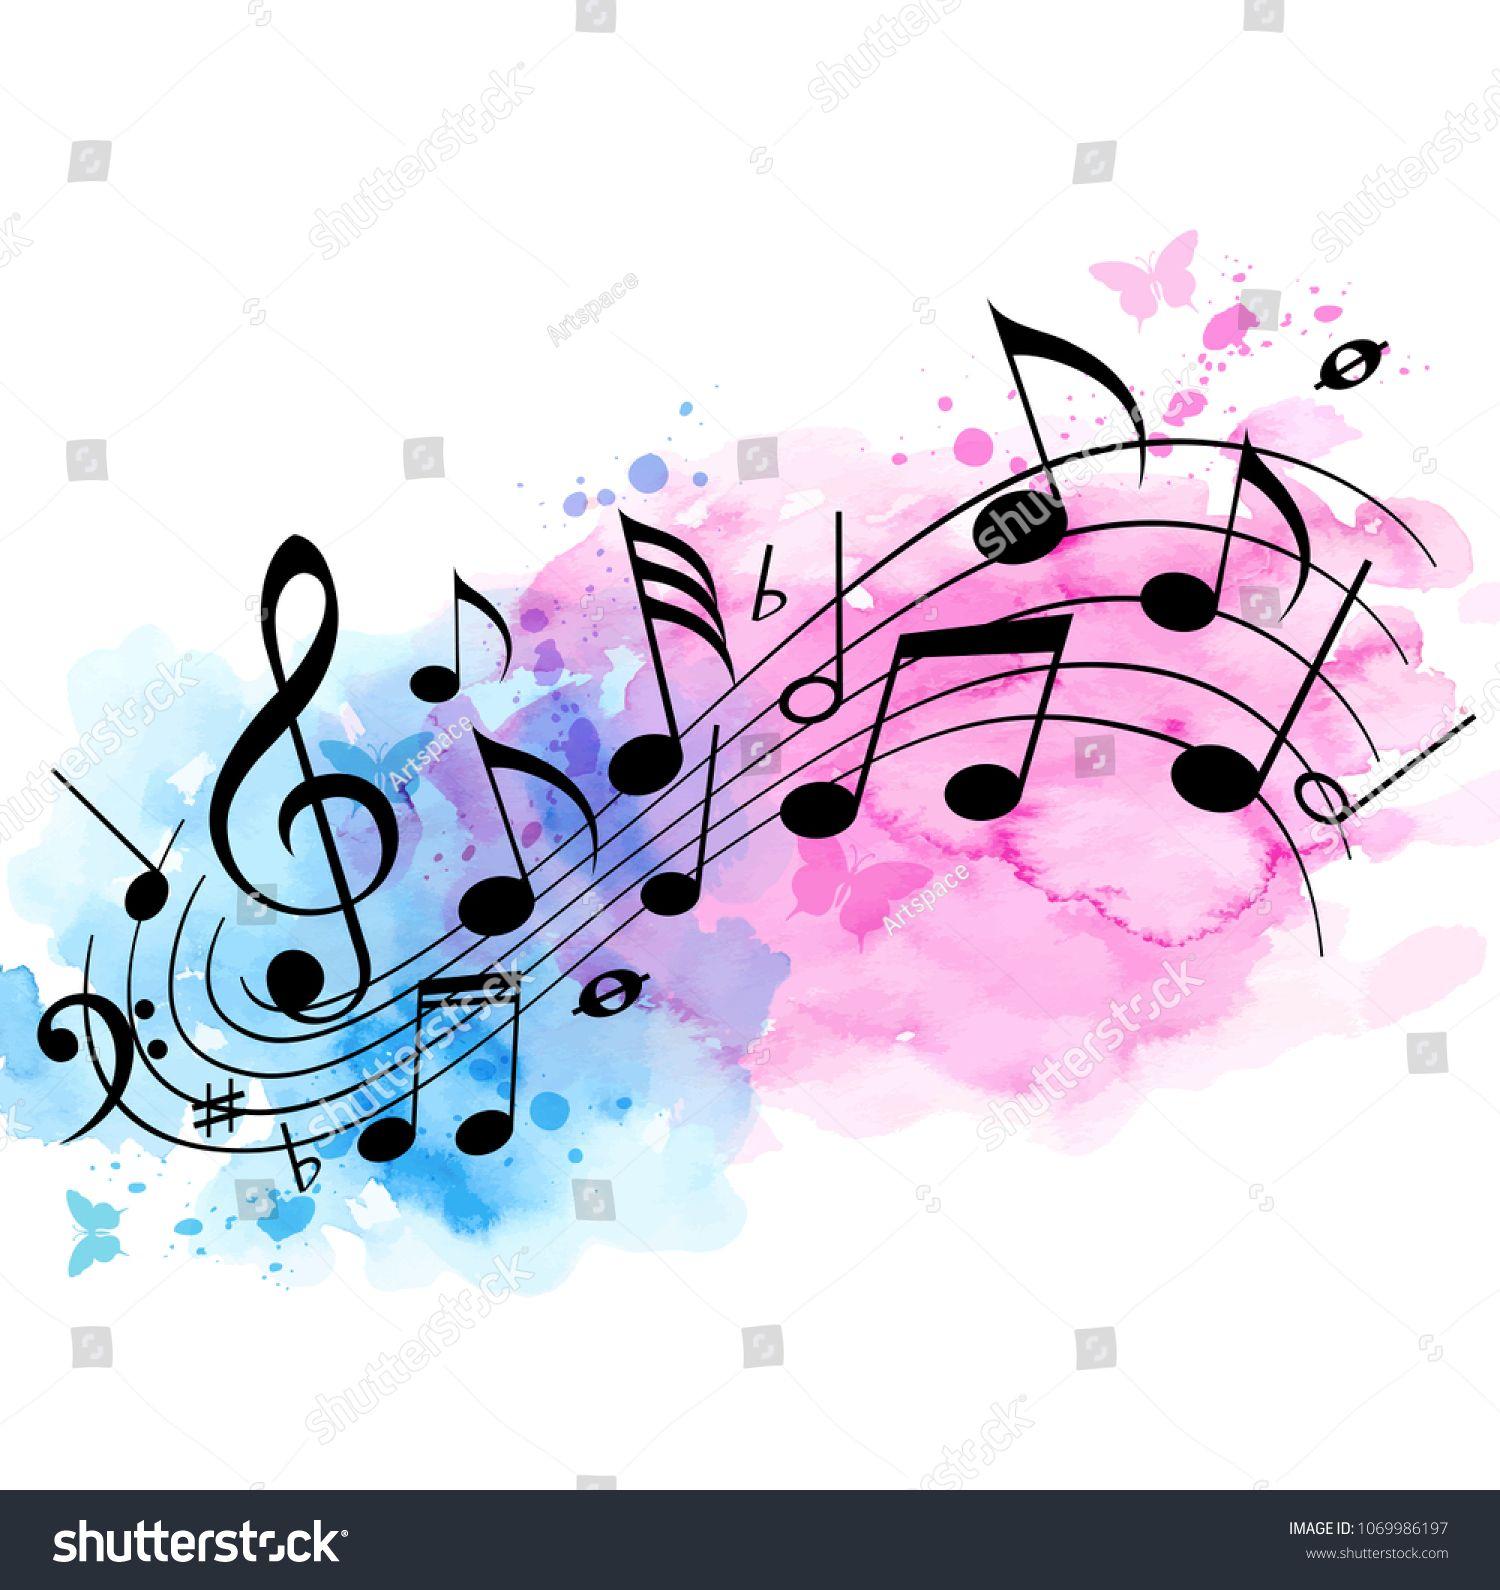 Abstract Vector Music Background With Notes And Watercolor Texture Music Vector Ab Imagenes De Notas Musicales Notas Musicales Dibujos Fotos De Notas Musicales